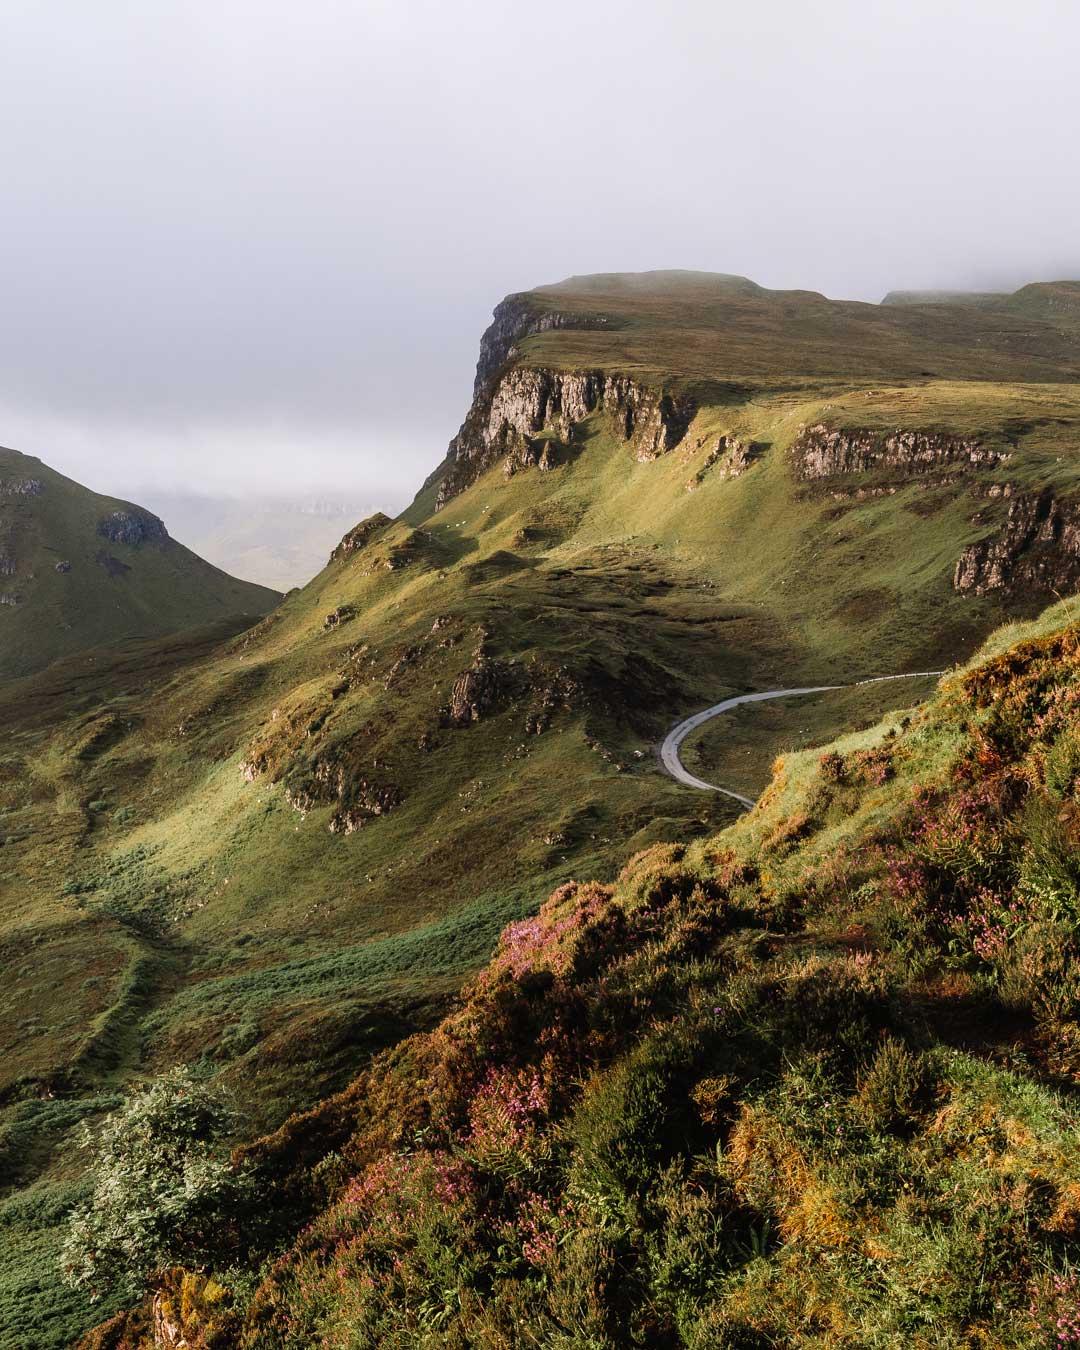 Quiraing Mountain on the Isle of Skye, Scotland